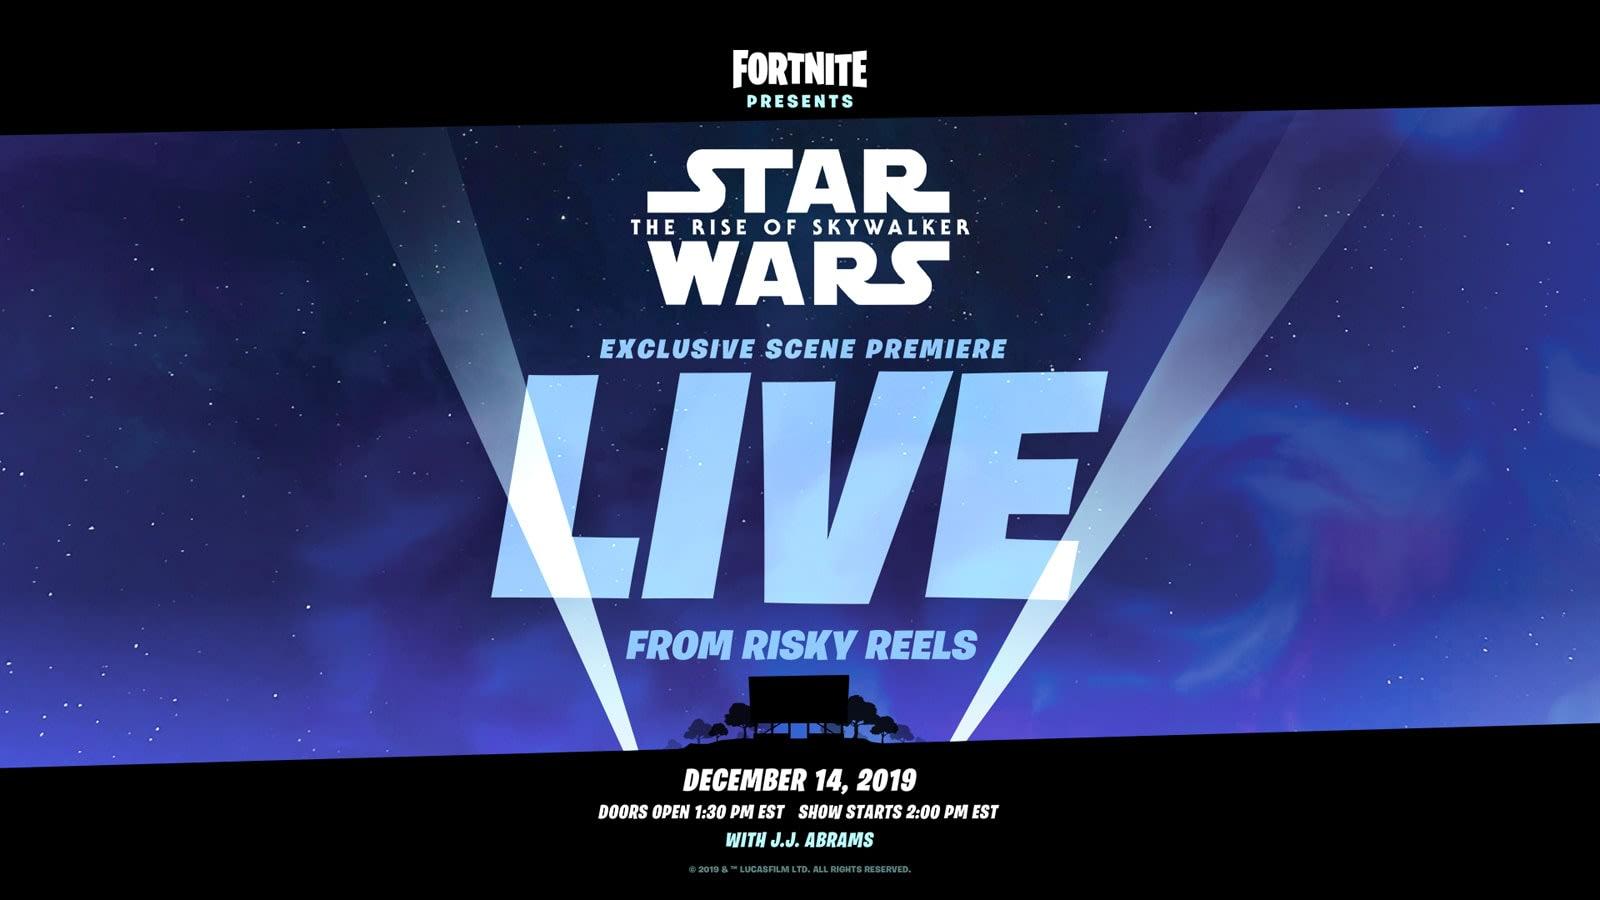 Fortnite Will Premiere A Star Wars Scene With Jj Abrams